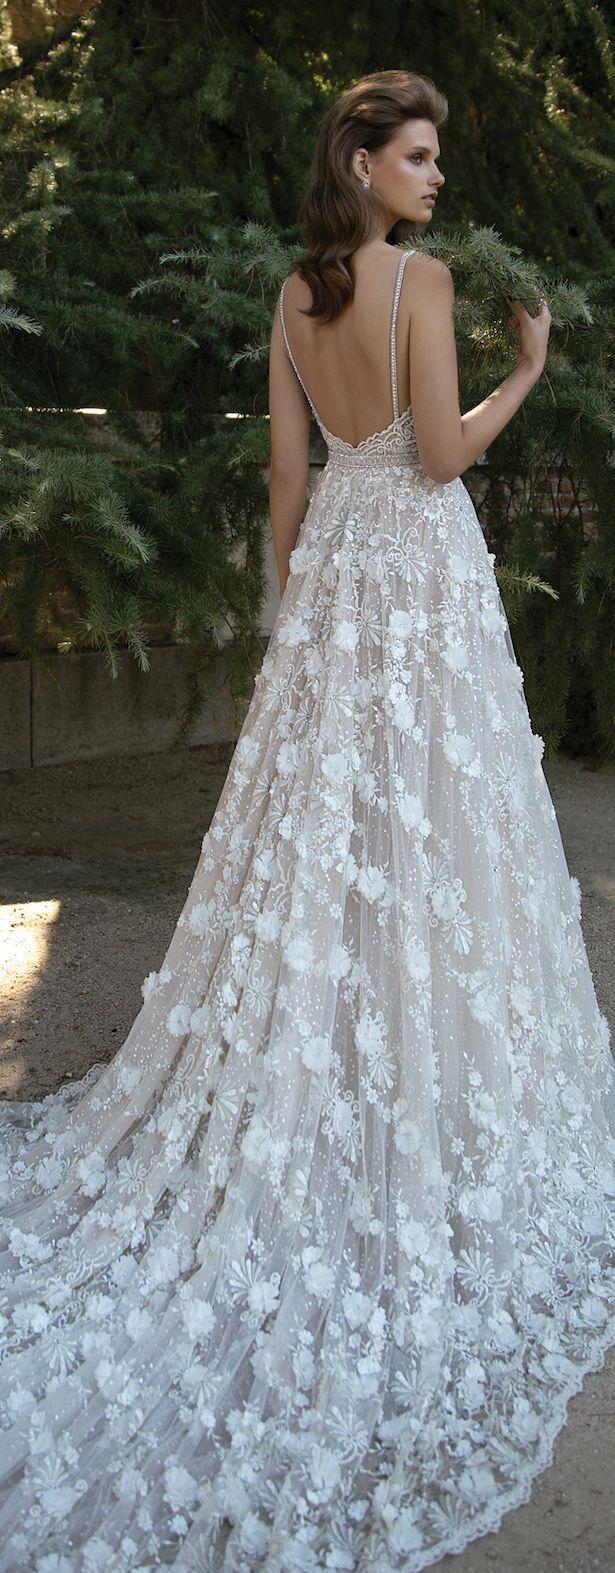 112 best Wedding Dresses images on Pinterest | Party dresses ...